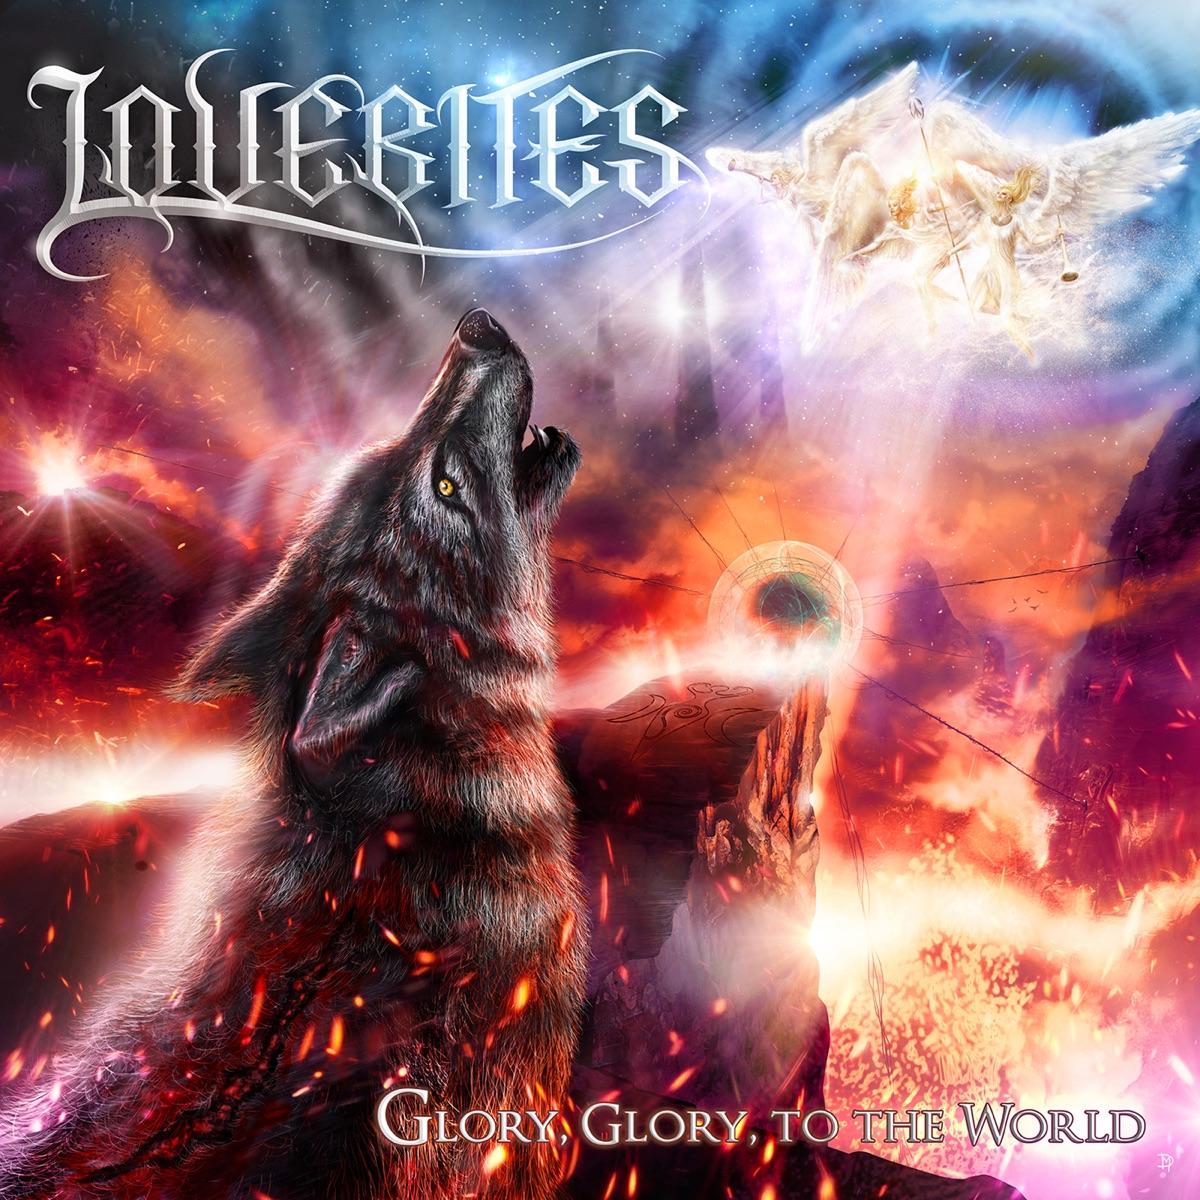 『LOVEBITES - GLORY TO THE WORLD』収録の『GLORY, GLORY, TO THE WORLD』ジャケット